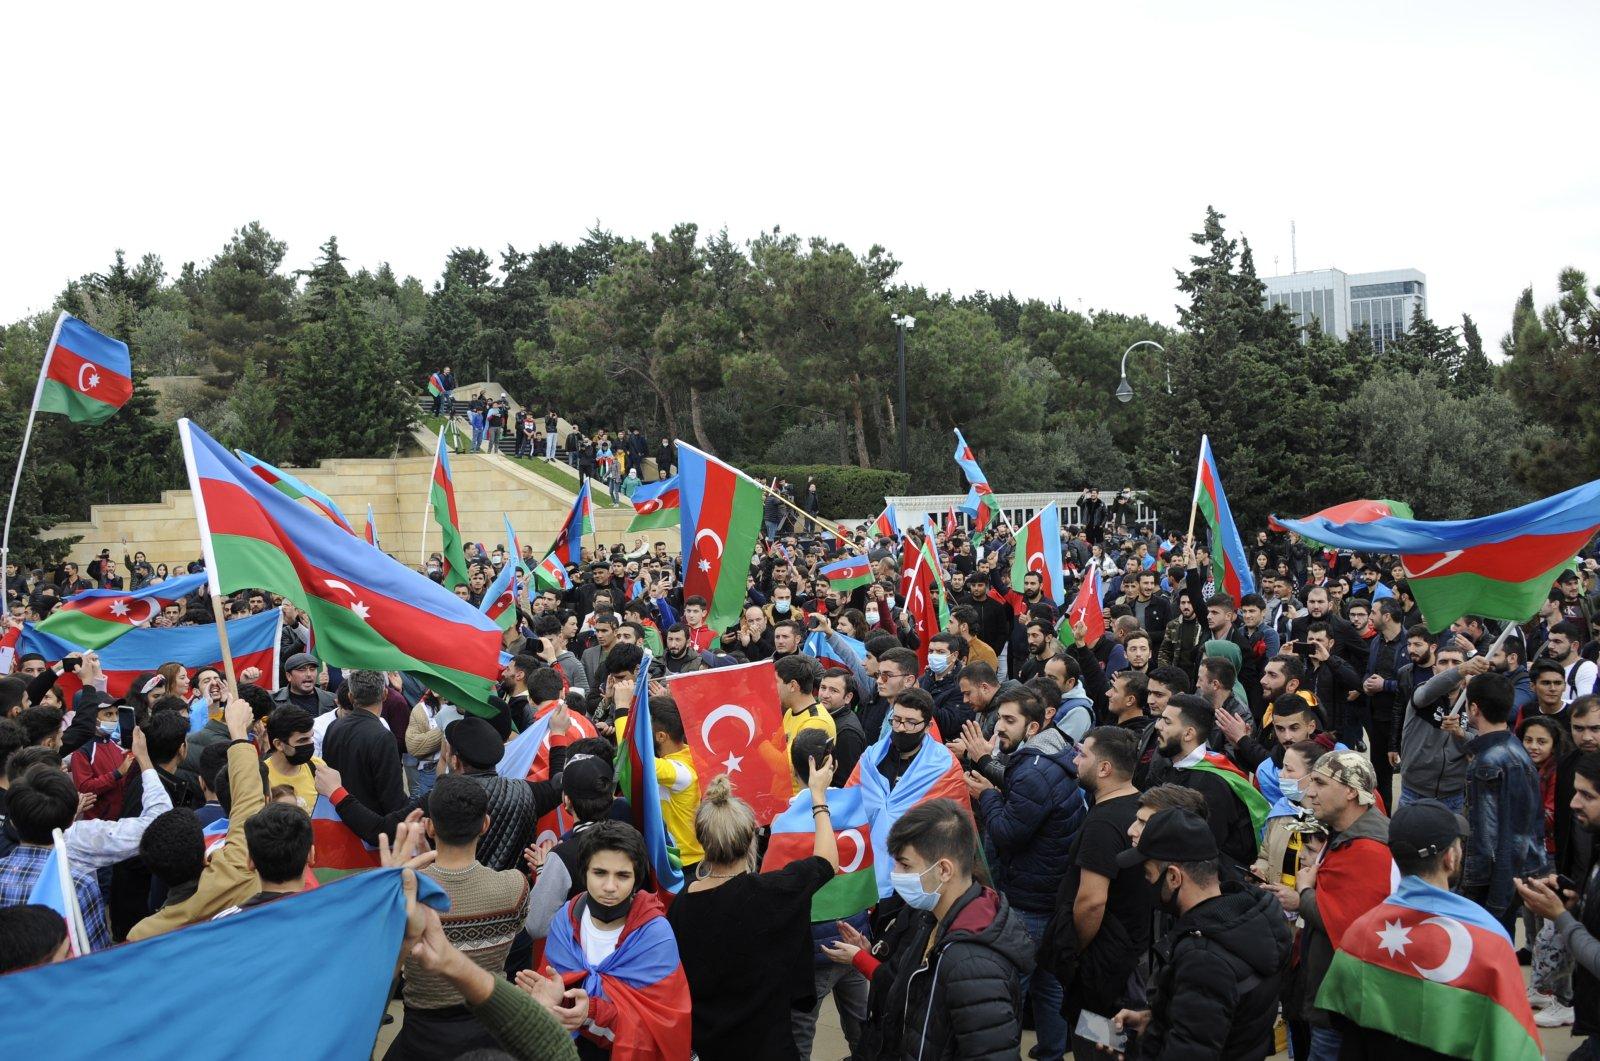 Azerbaijani people celebrate in Baku, Azerbaijan, Nov. 10, 2020. (EPA Photo)